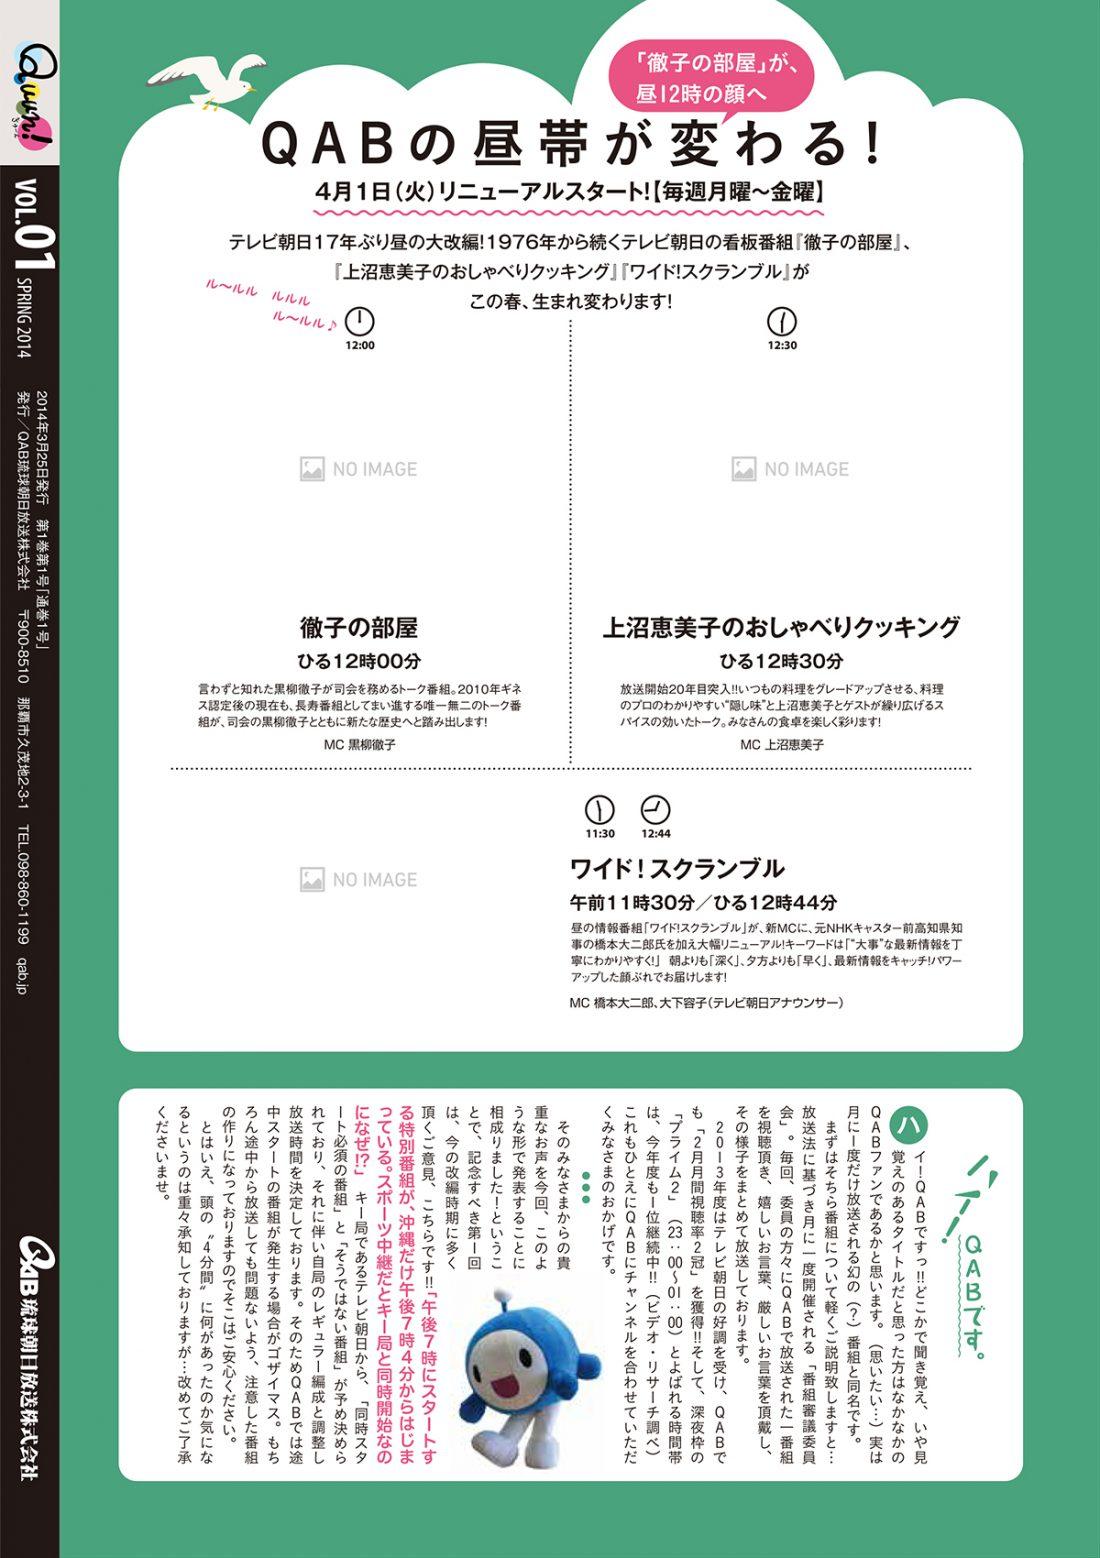 https://www.qab.co.jp/qgoro/wp-content/uploads/quun_0116-1100x1558.jpg